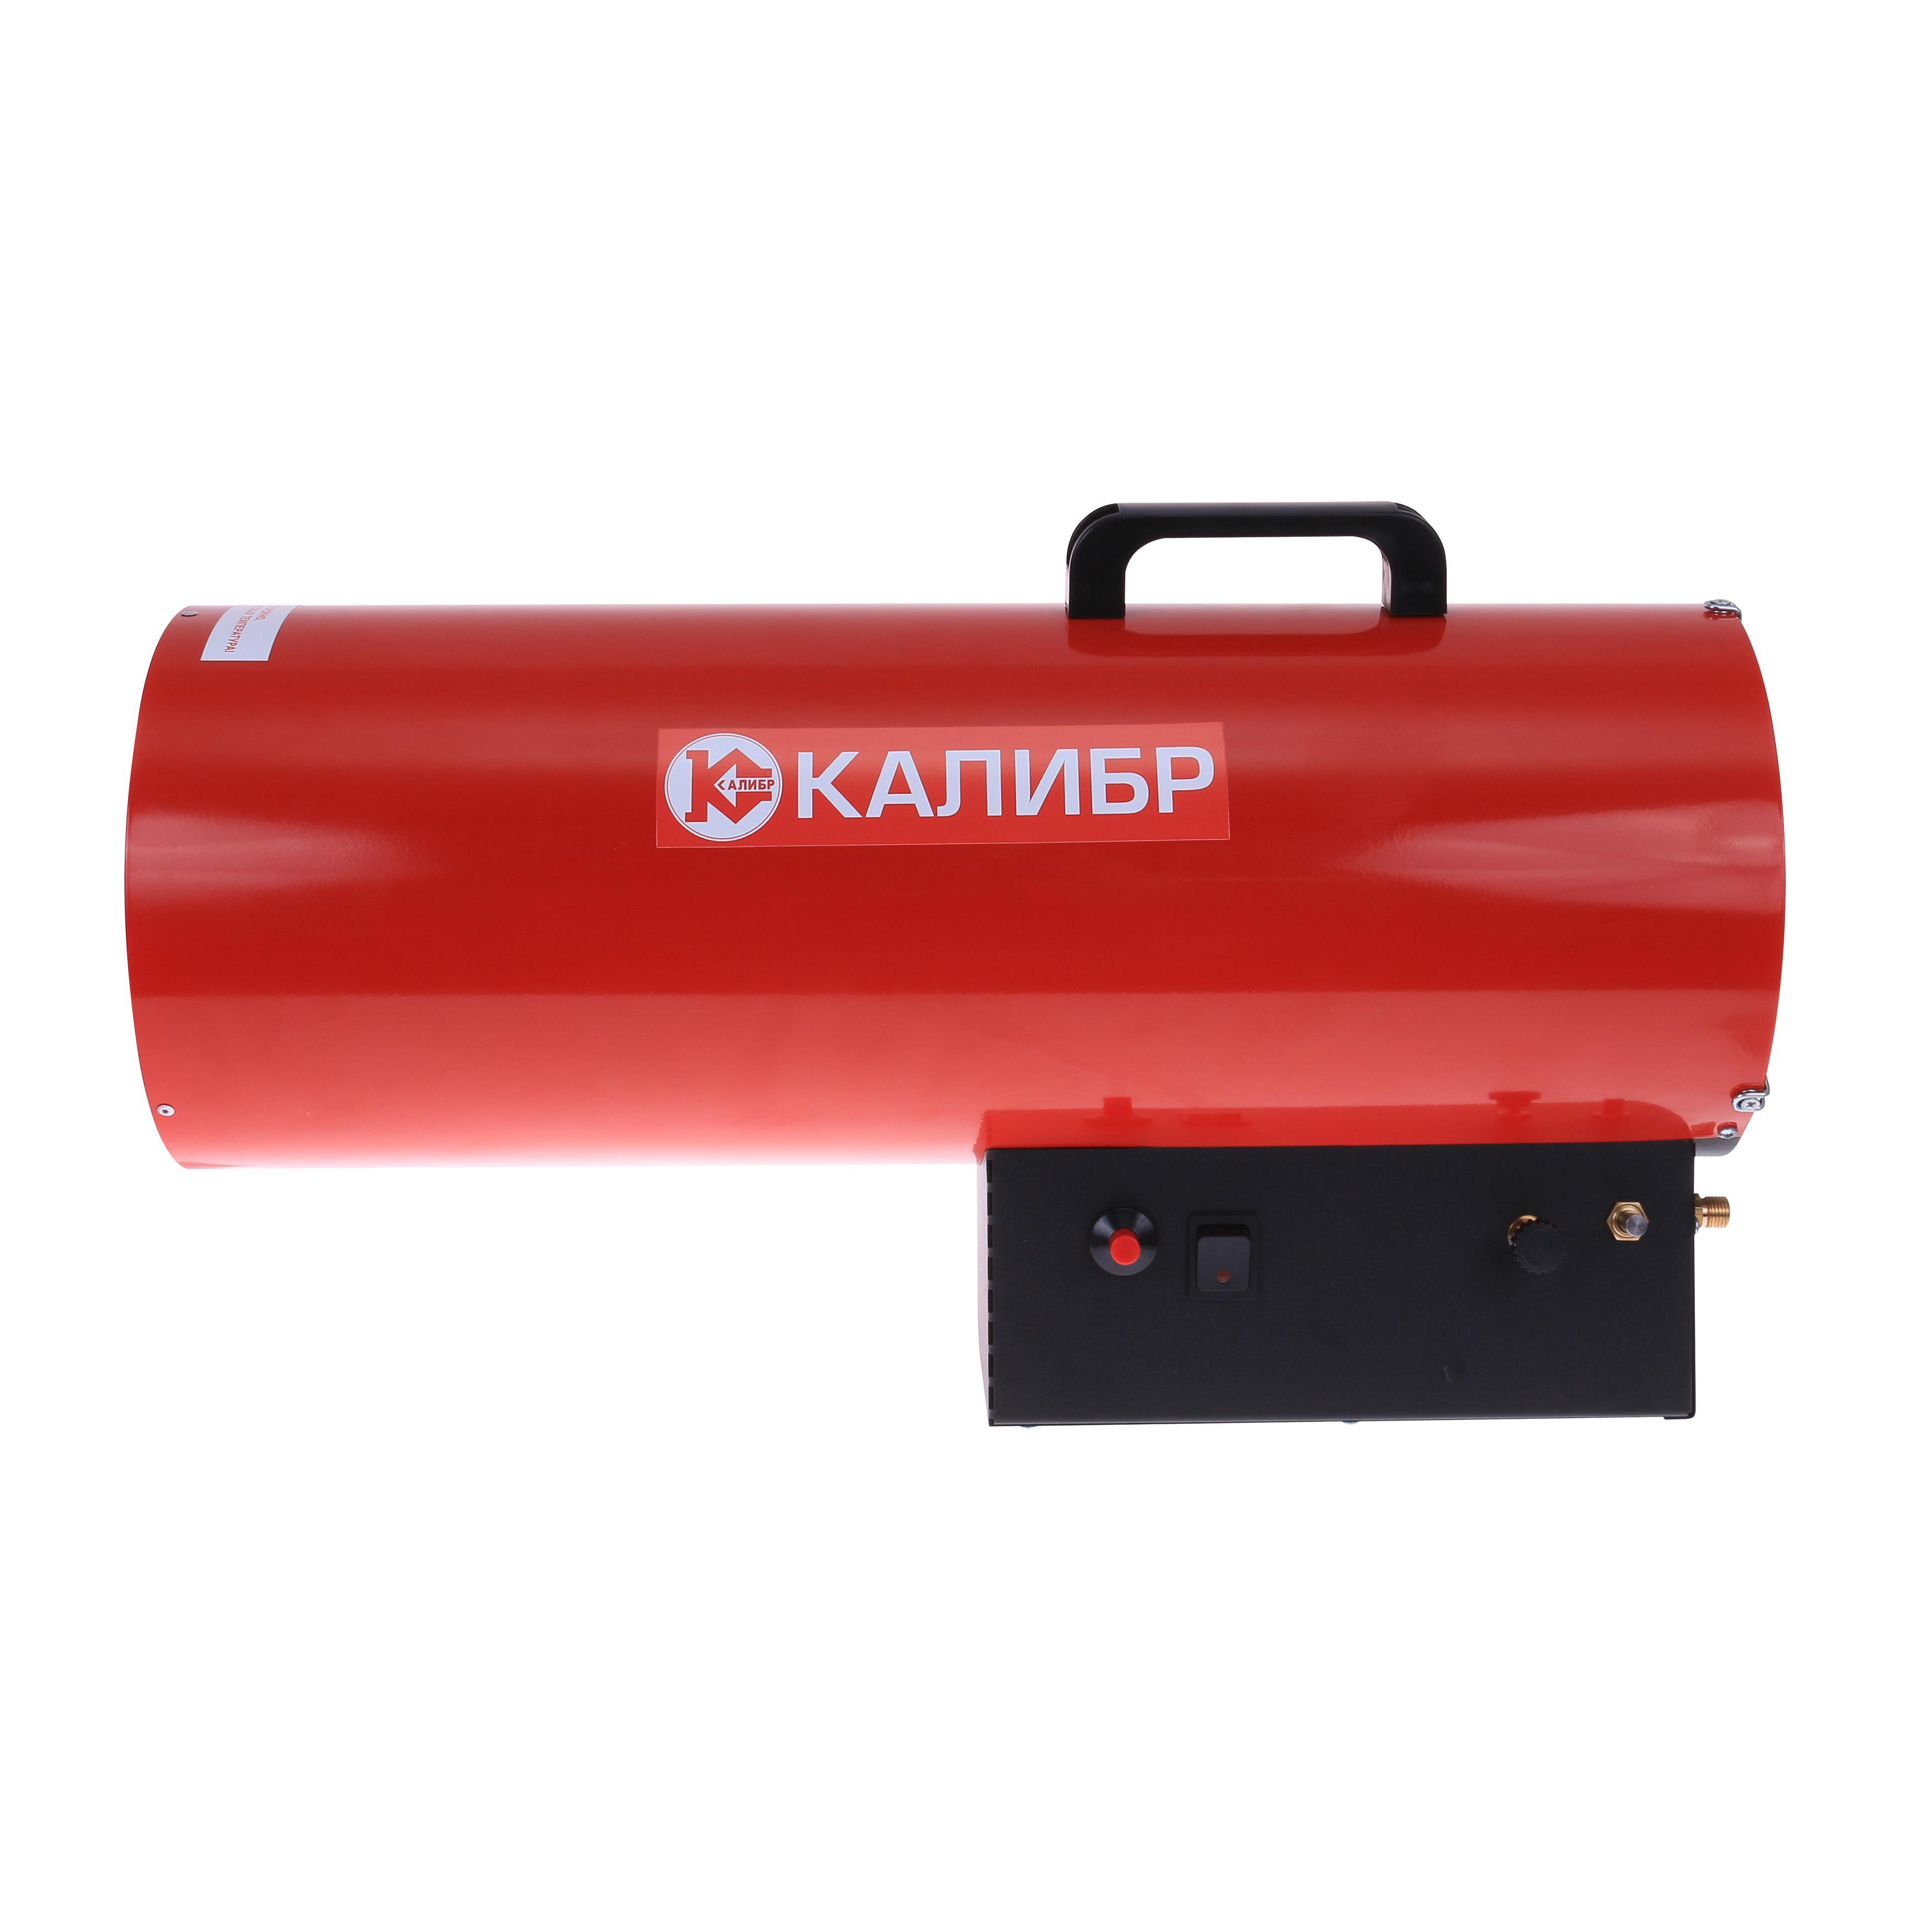 лучшая цена Тепловентилятор КАЛИБР ТПГ-33